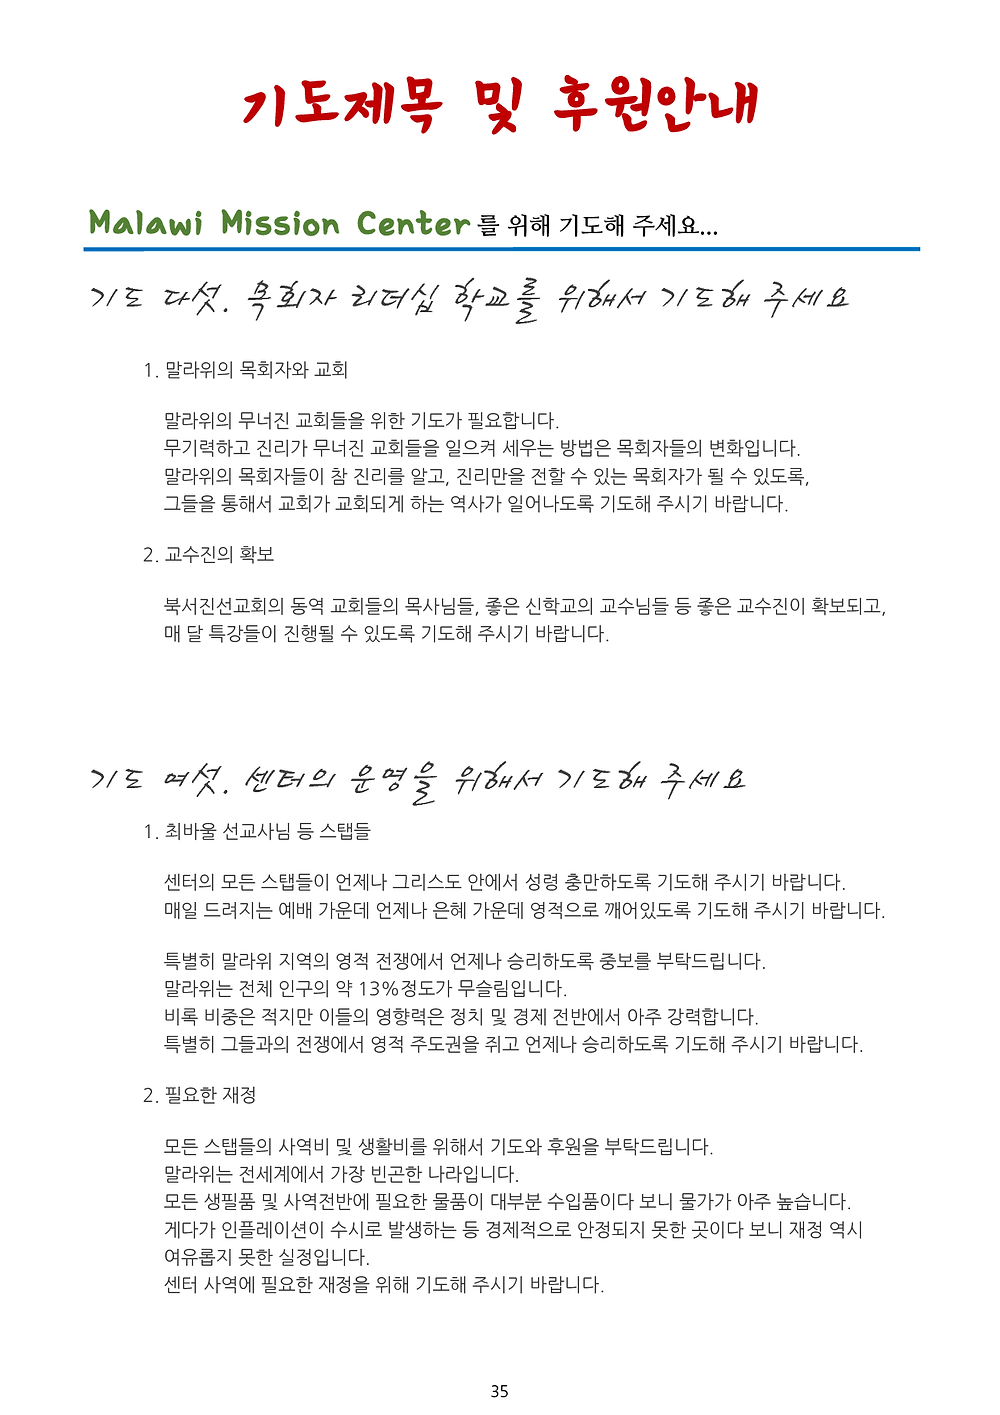 NWM 2014년 선교보고_35.png